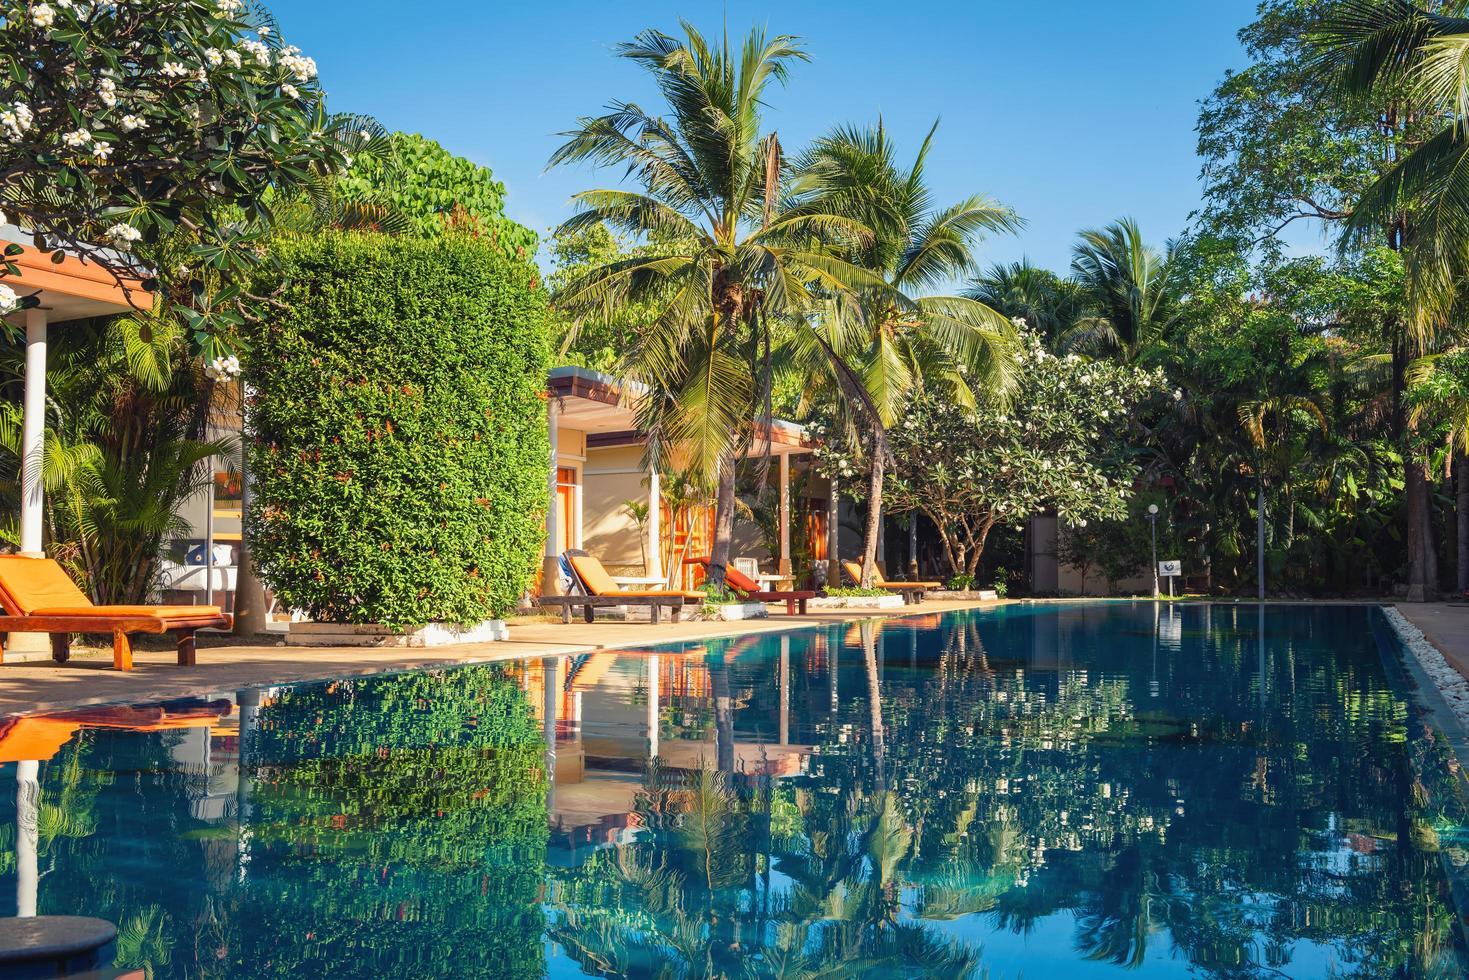 Scene of pool at resort photo